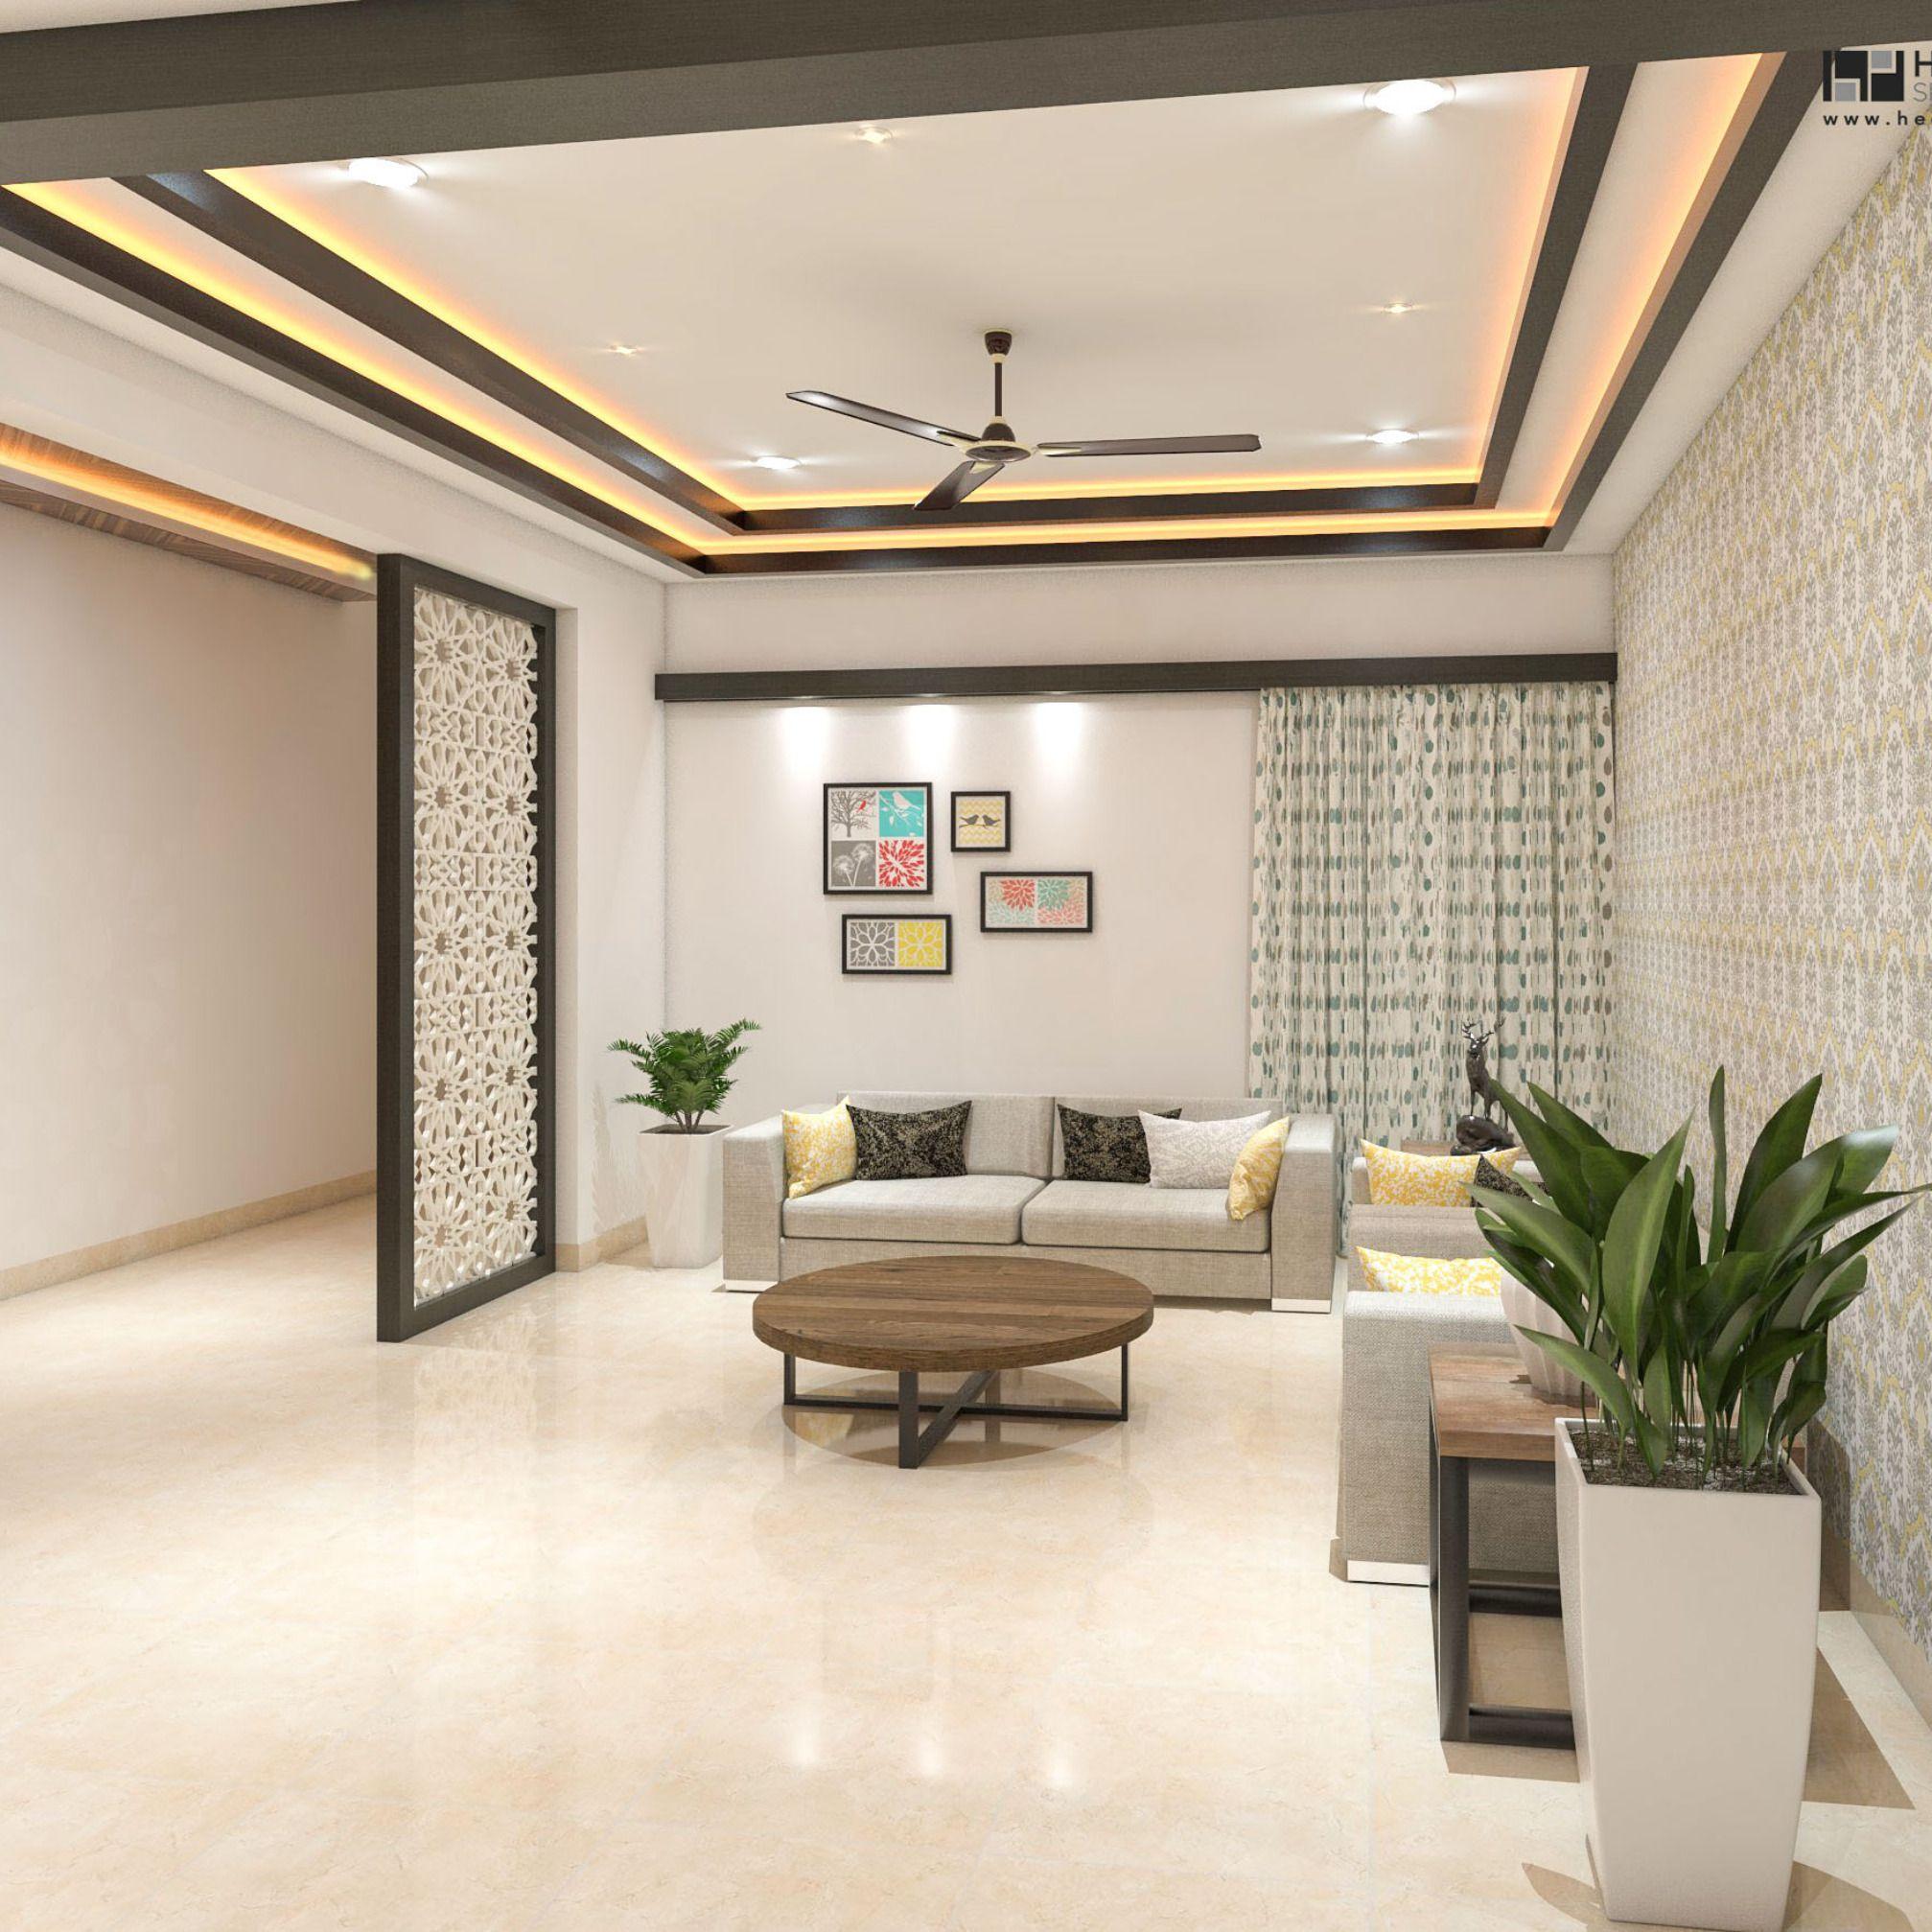 Top 10 False Ceiling Designs Ceiling Design Bedroom Ceiling Design Living Room Bedroom False Ceiling Design #simple #living #room #ceiling #design